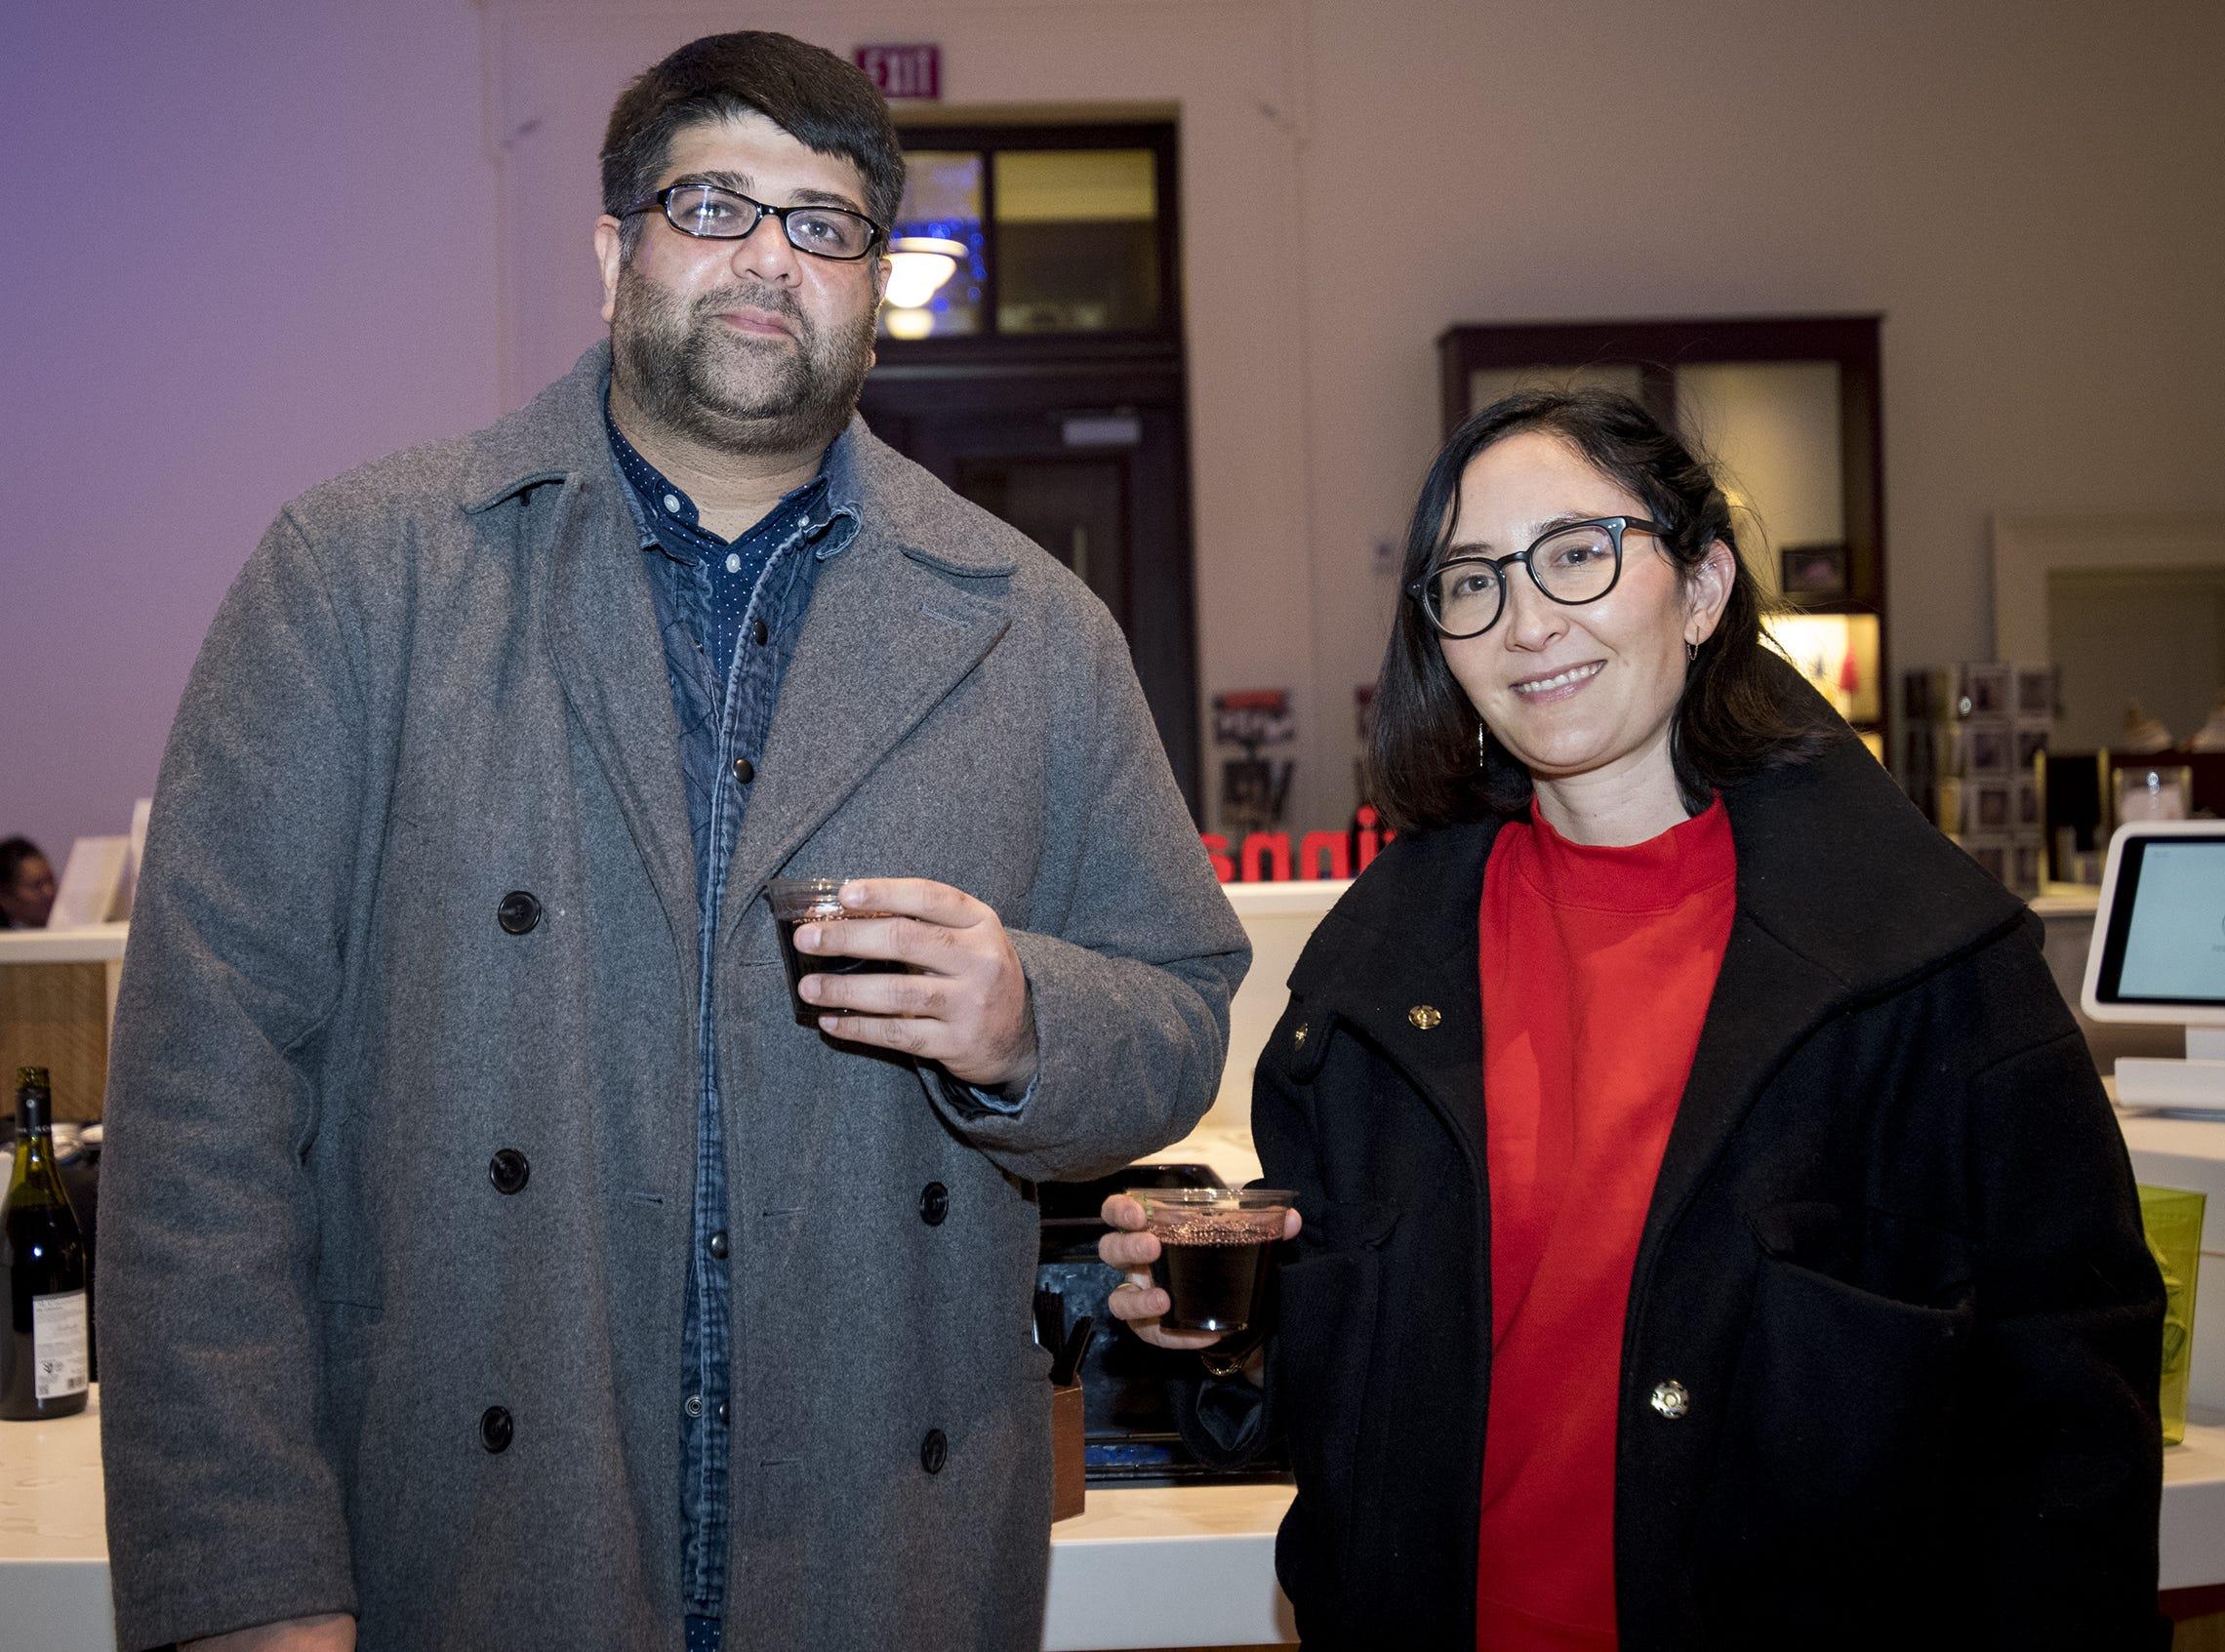 Bhavik Joshi and Angelique Clark attend Art After Dark at the Cincinnati Art Museum Wednesday, November 21, 2018 in Cincinnati, Ohio.